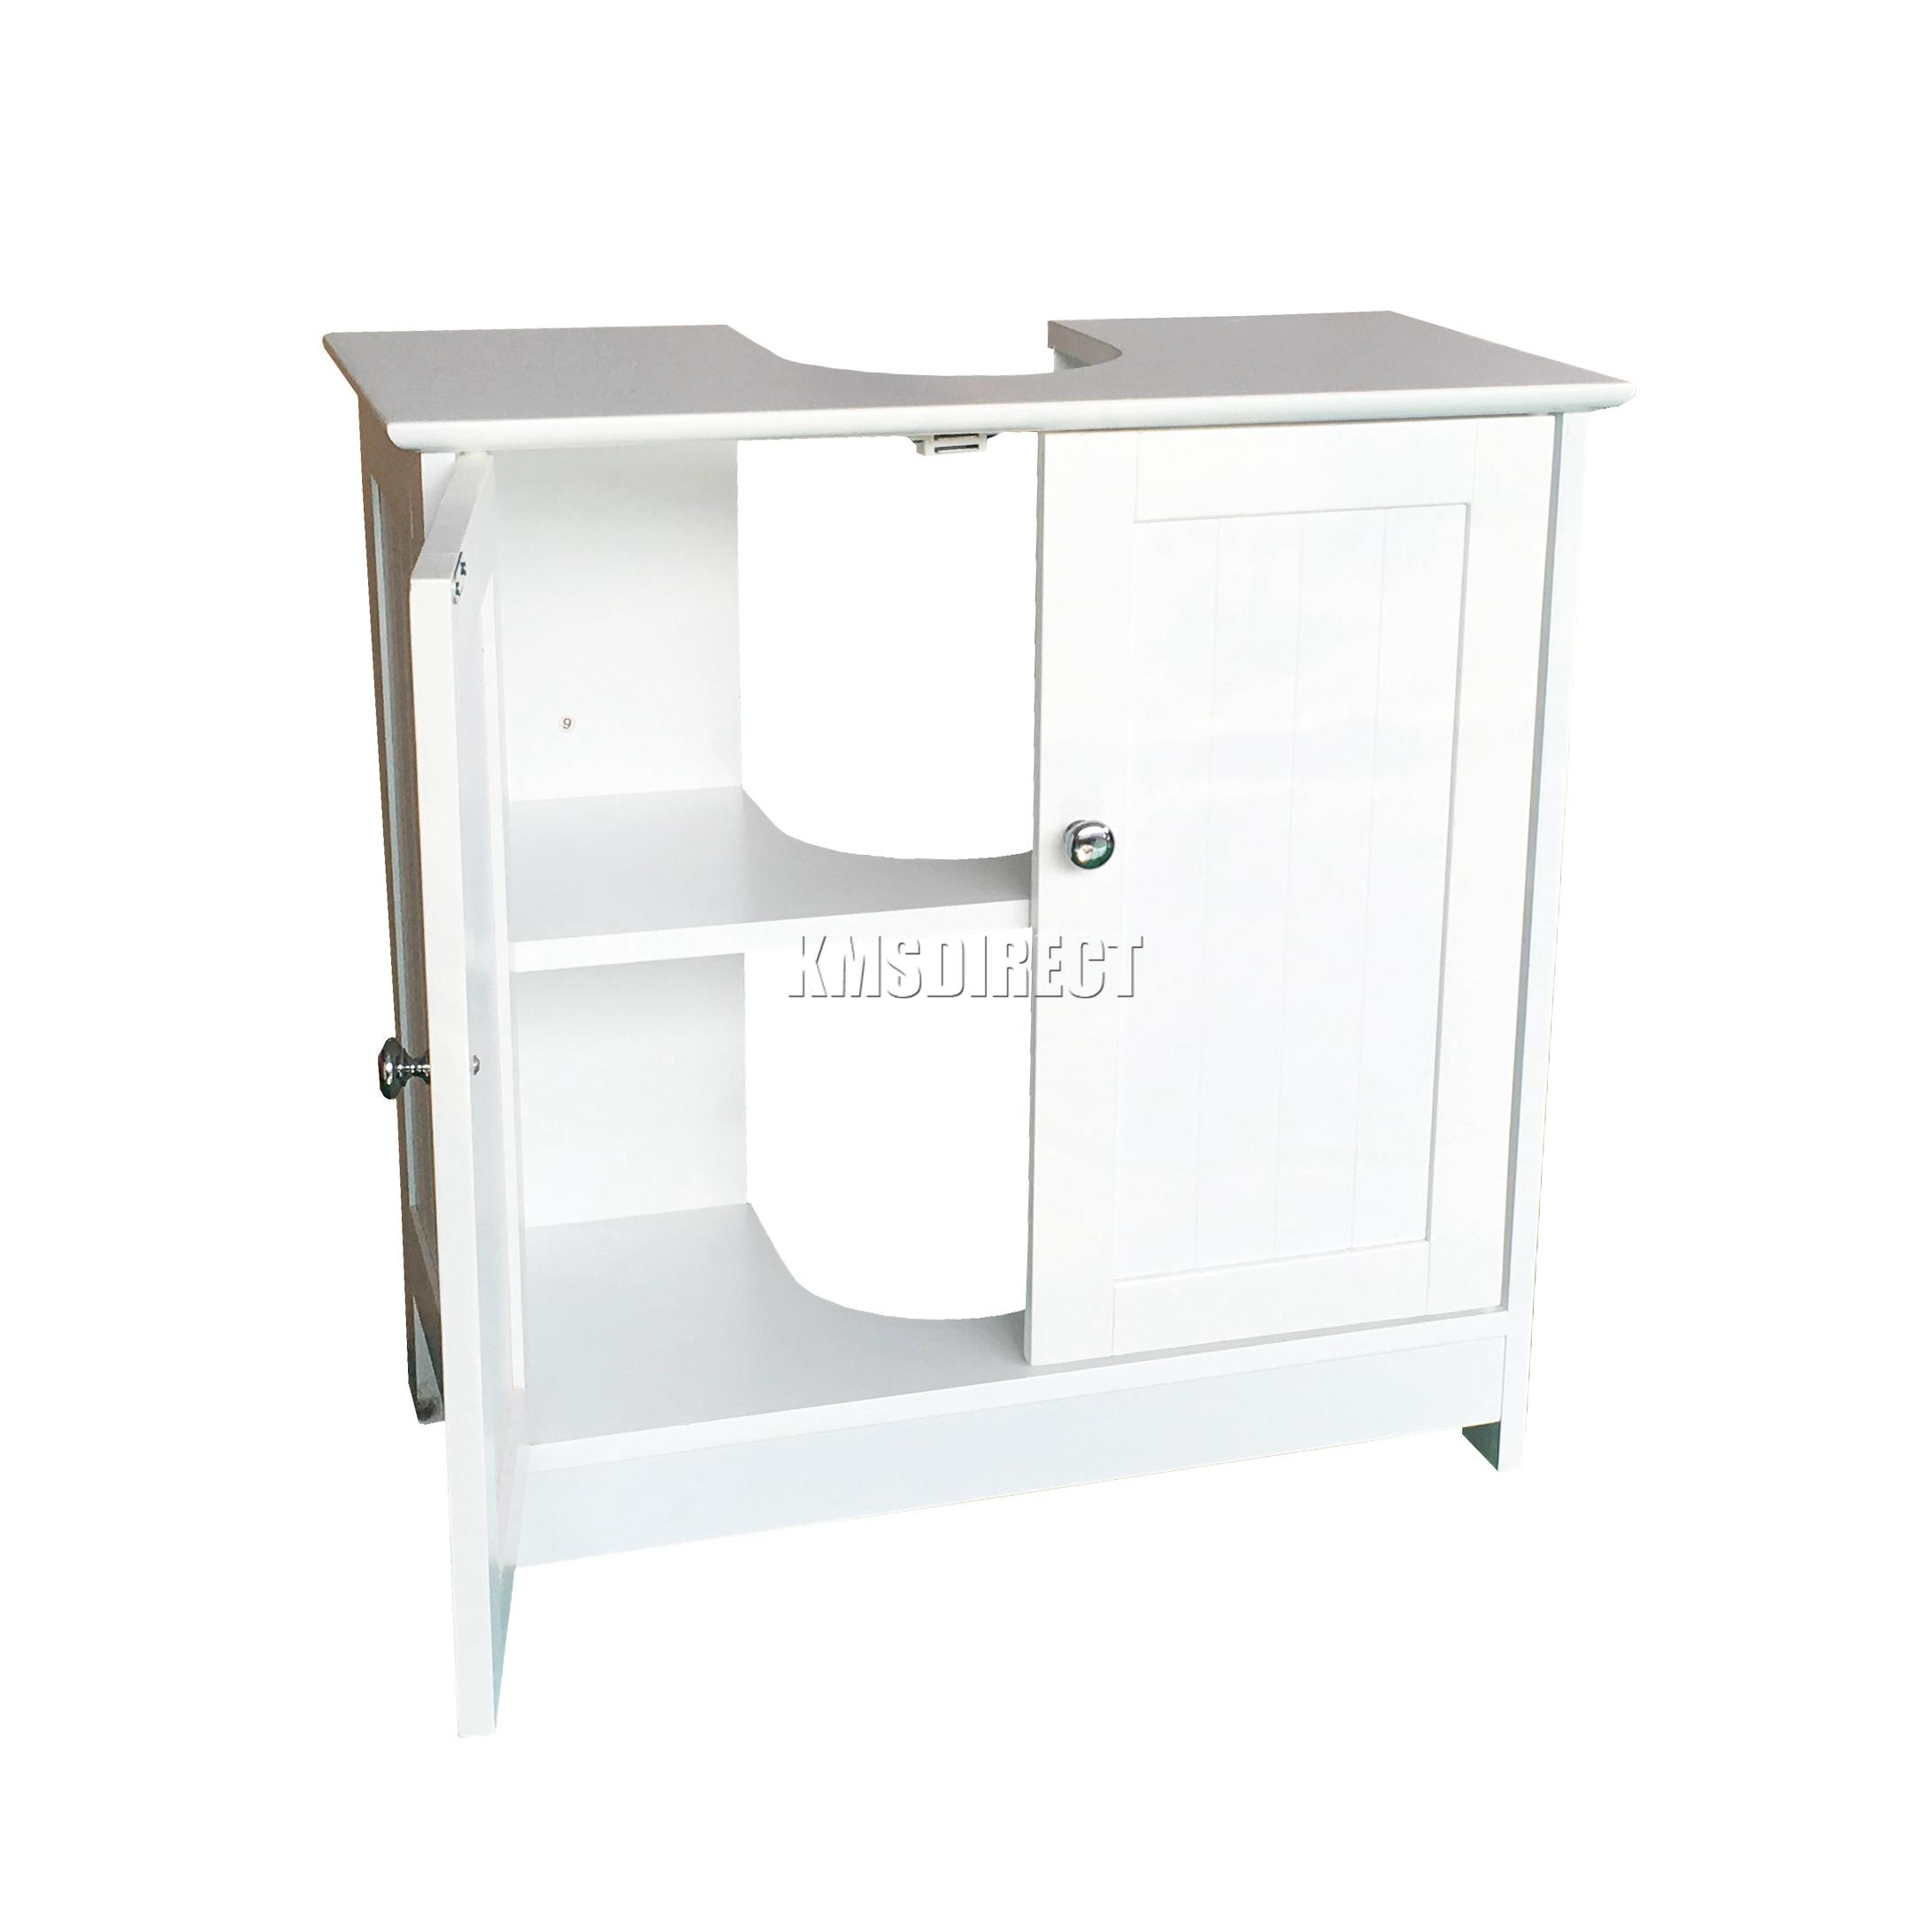 Foxhunter Vanity Unit Wooden Under Wash Basin Bathroom Cabinet Storage Cupboard Ebay